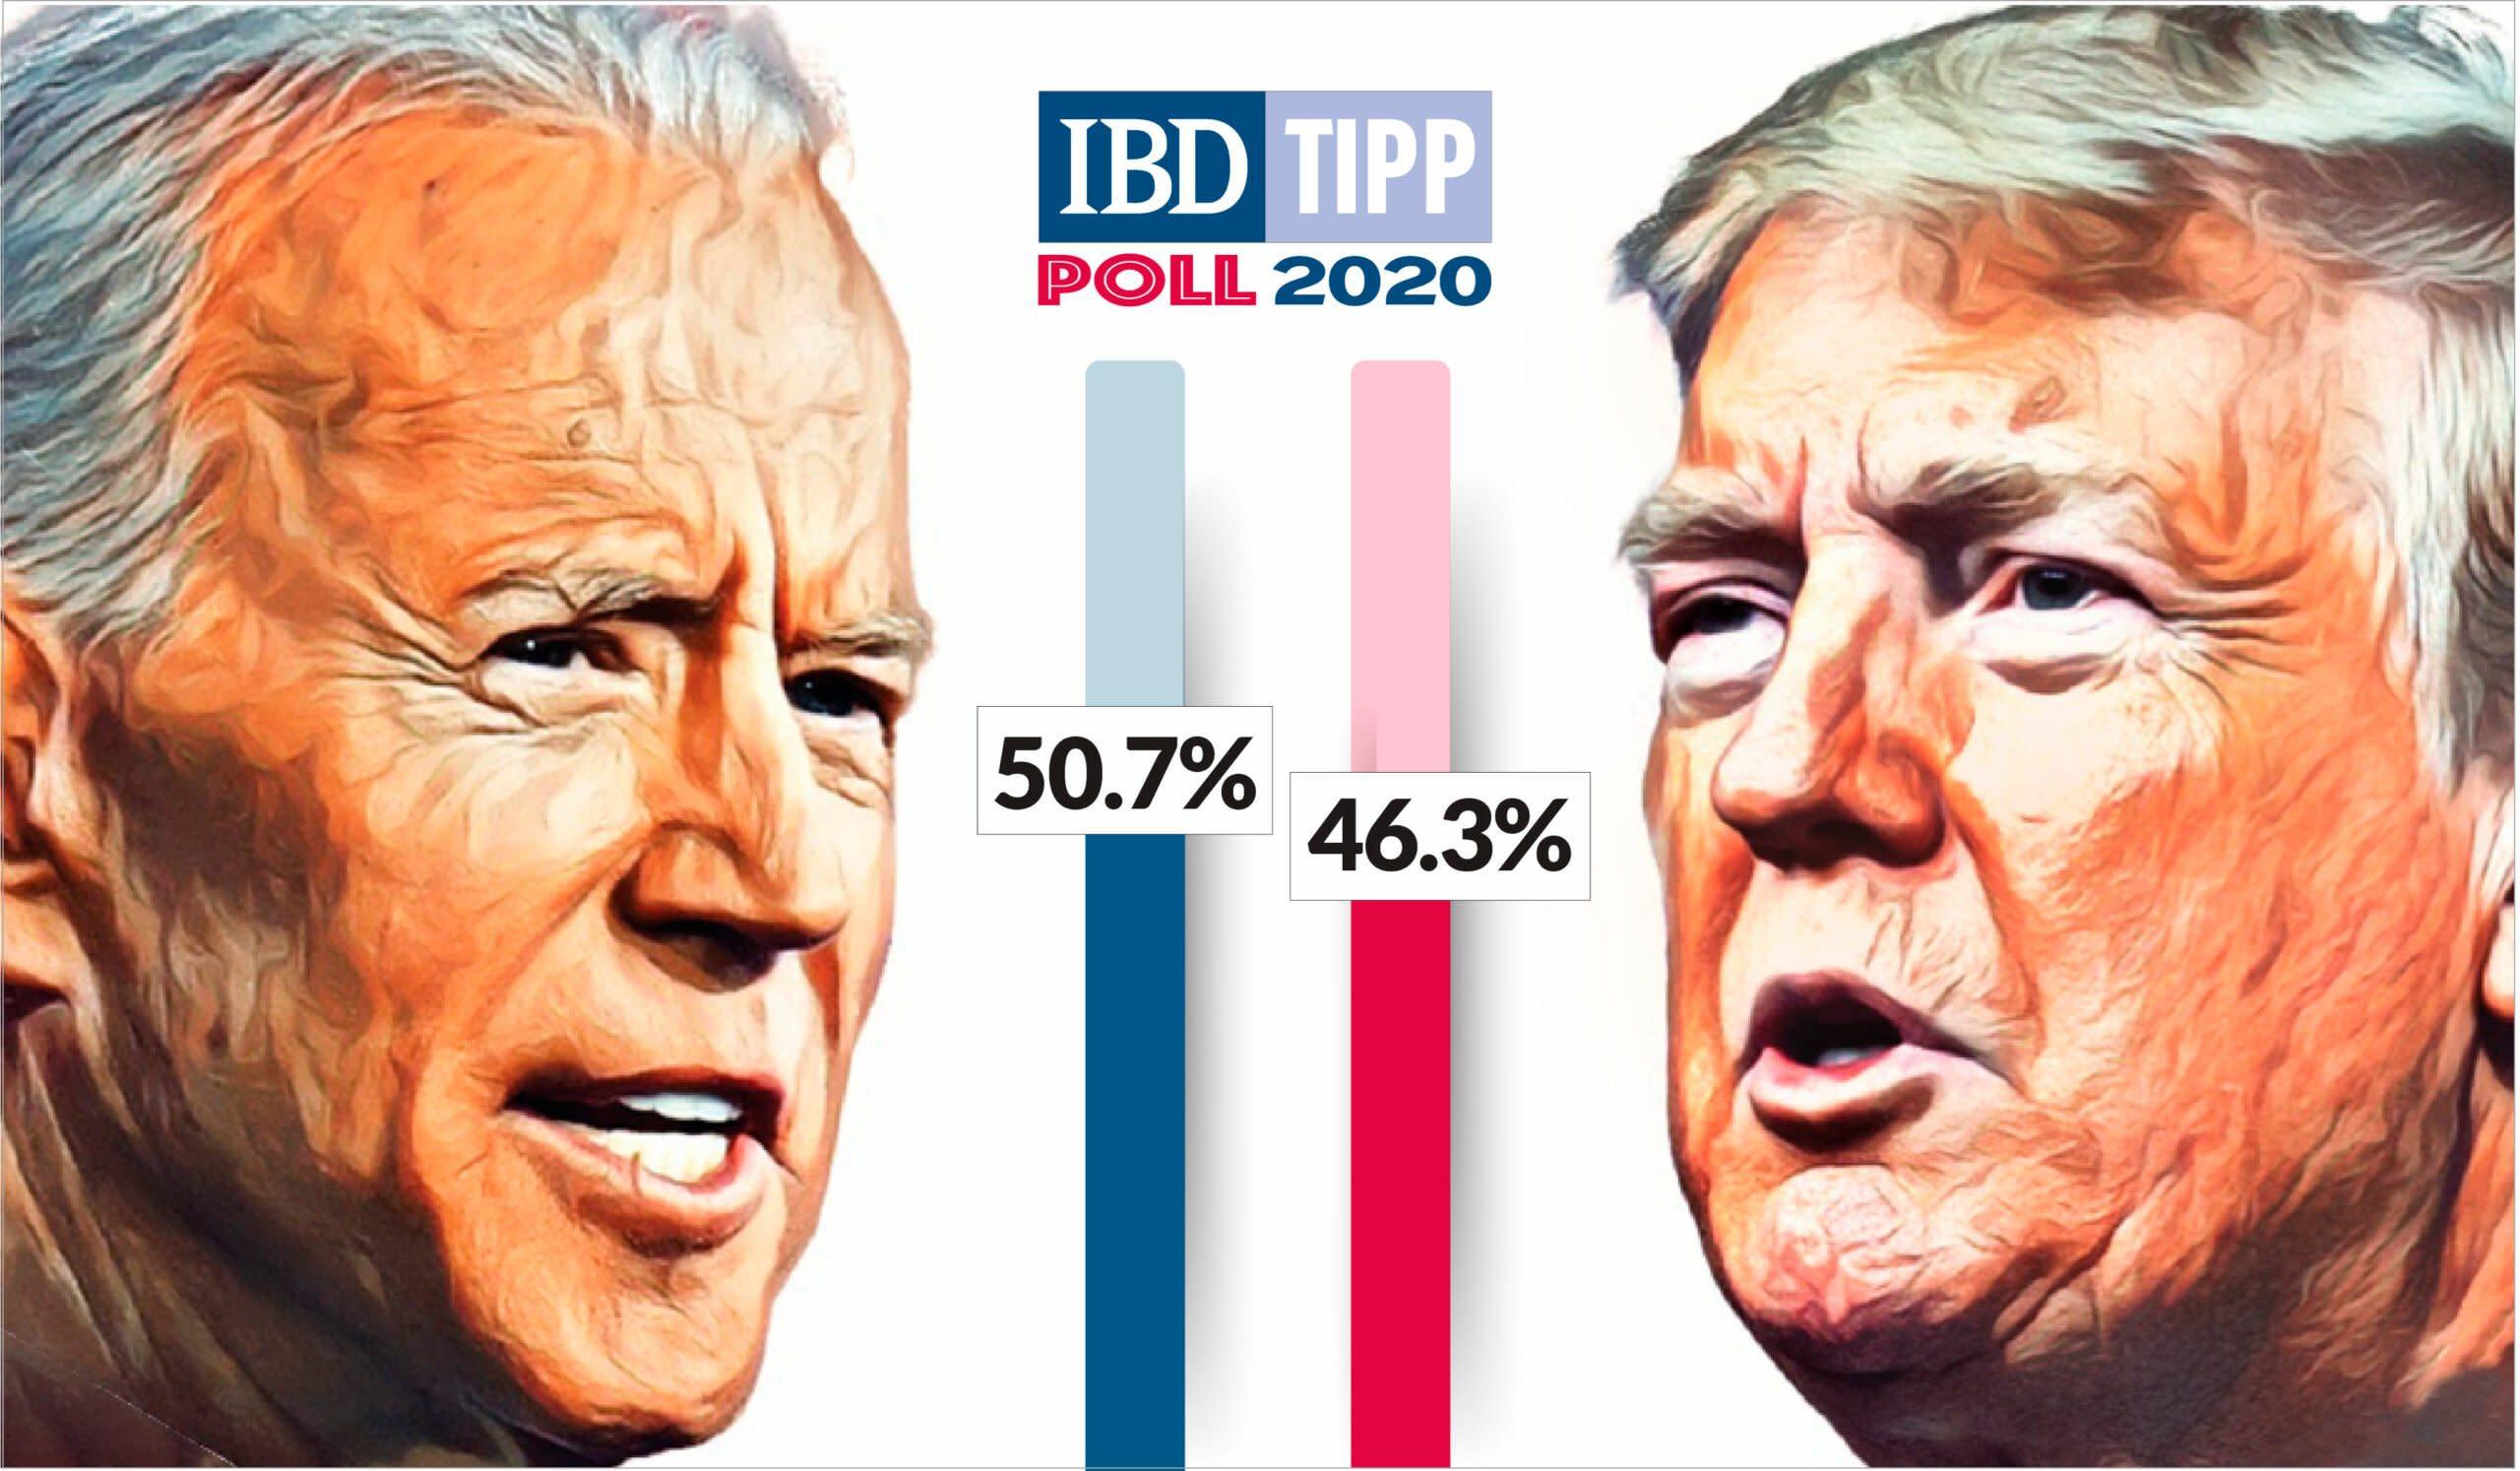 Biden Vs Trump Poll Joe Biden Lead Shrinks As Donald Trump Tops 2016 Vote Share Ibd Tipp Shows